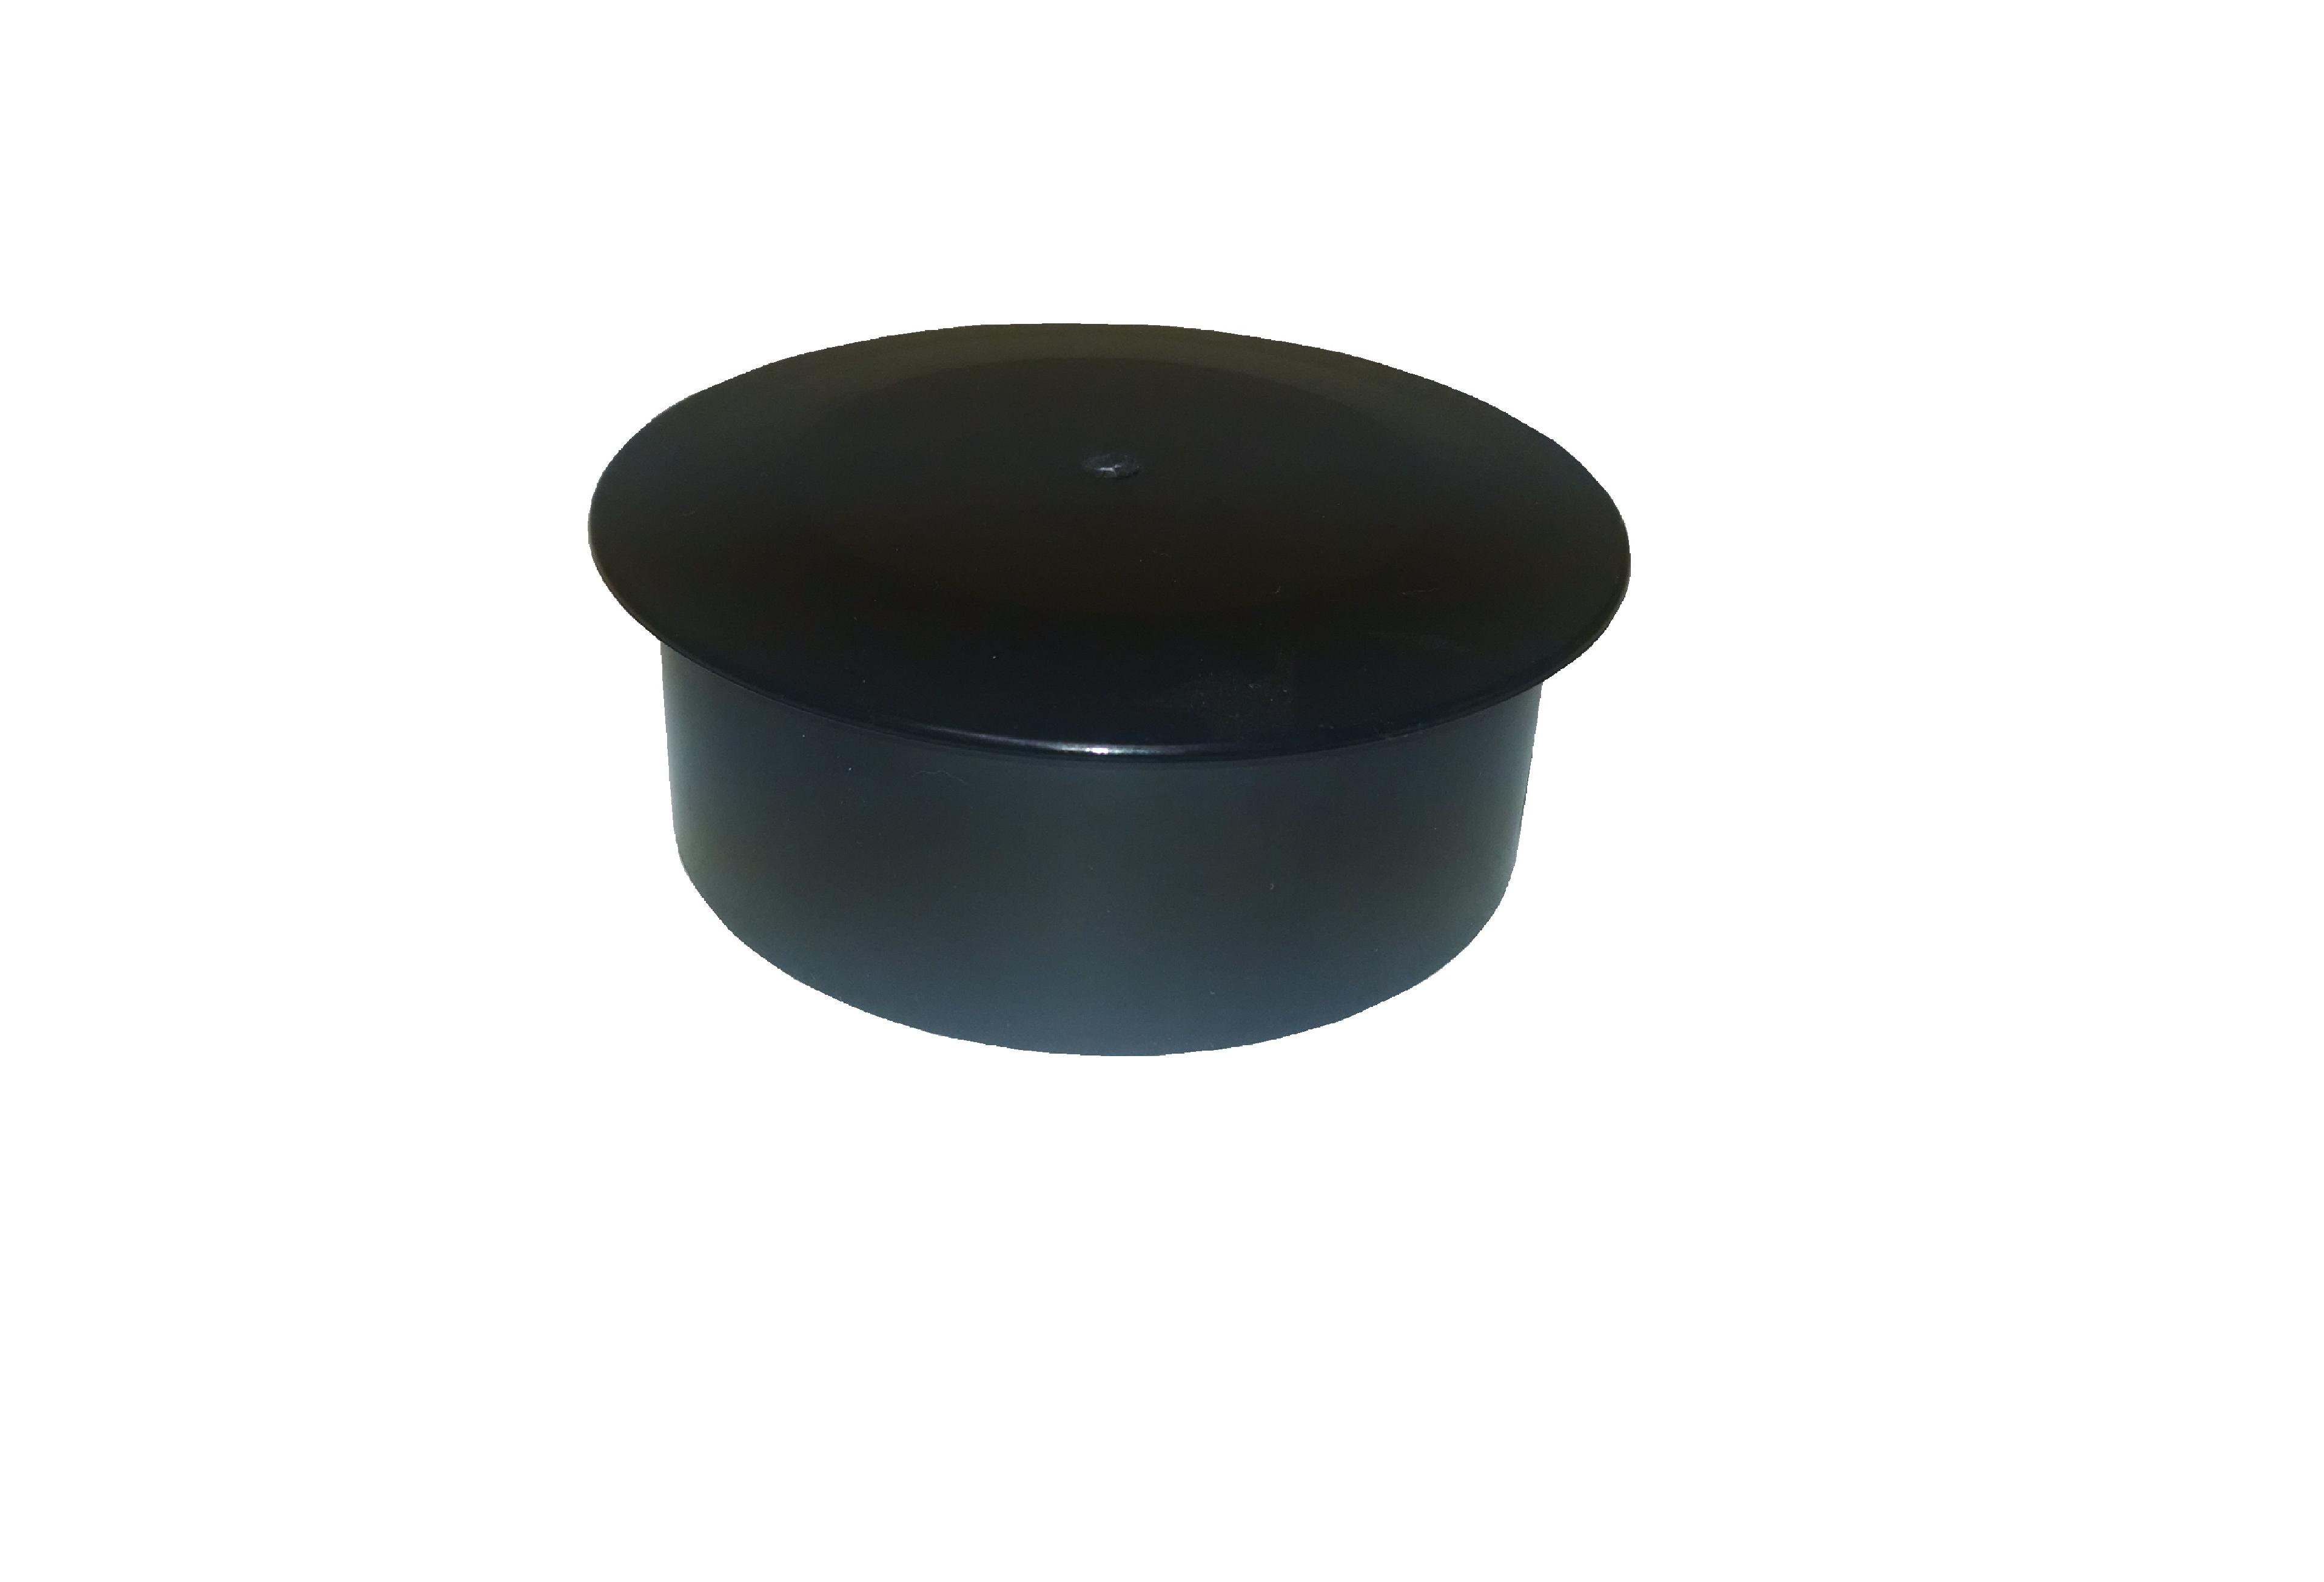 plug, plastic plug, desk plugs, 2 1/2 inch plug